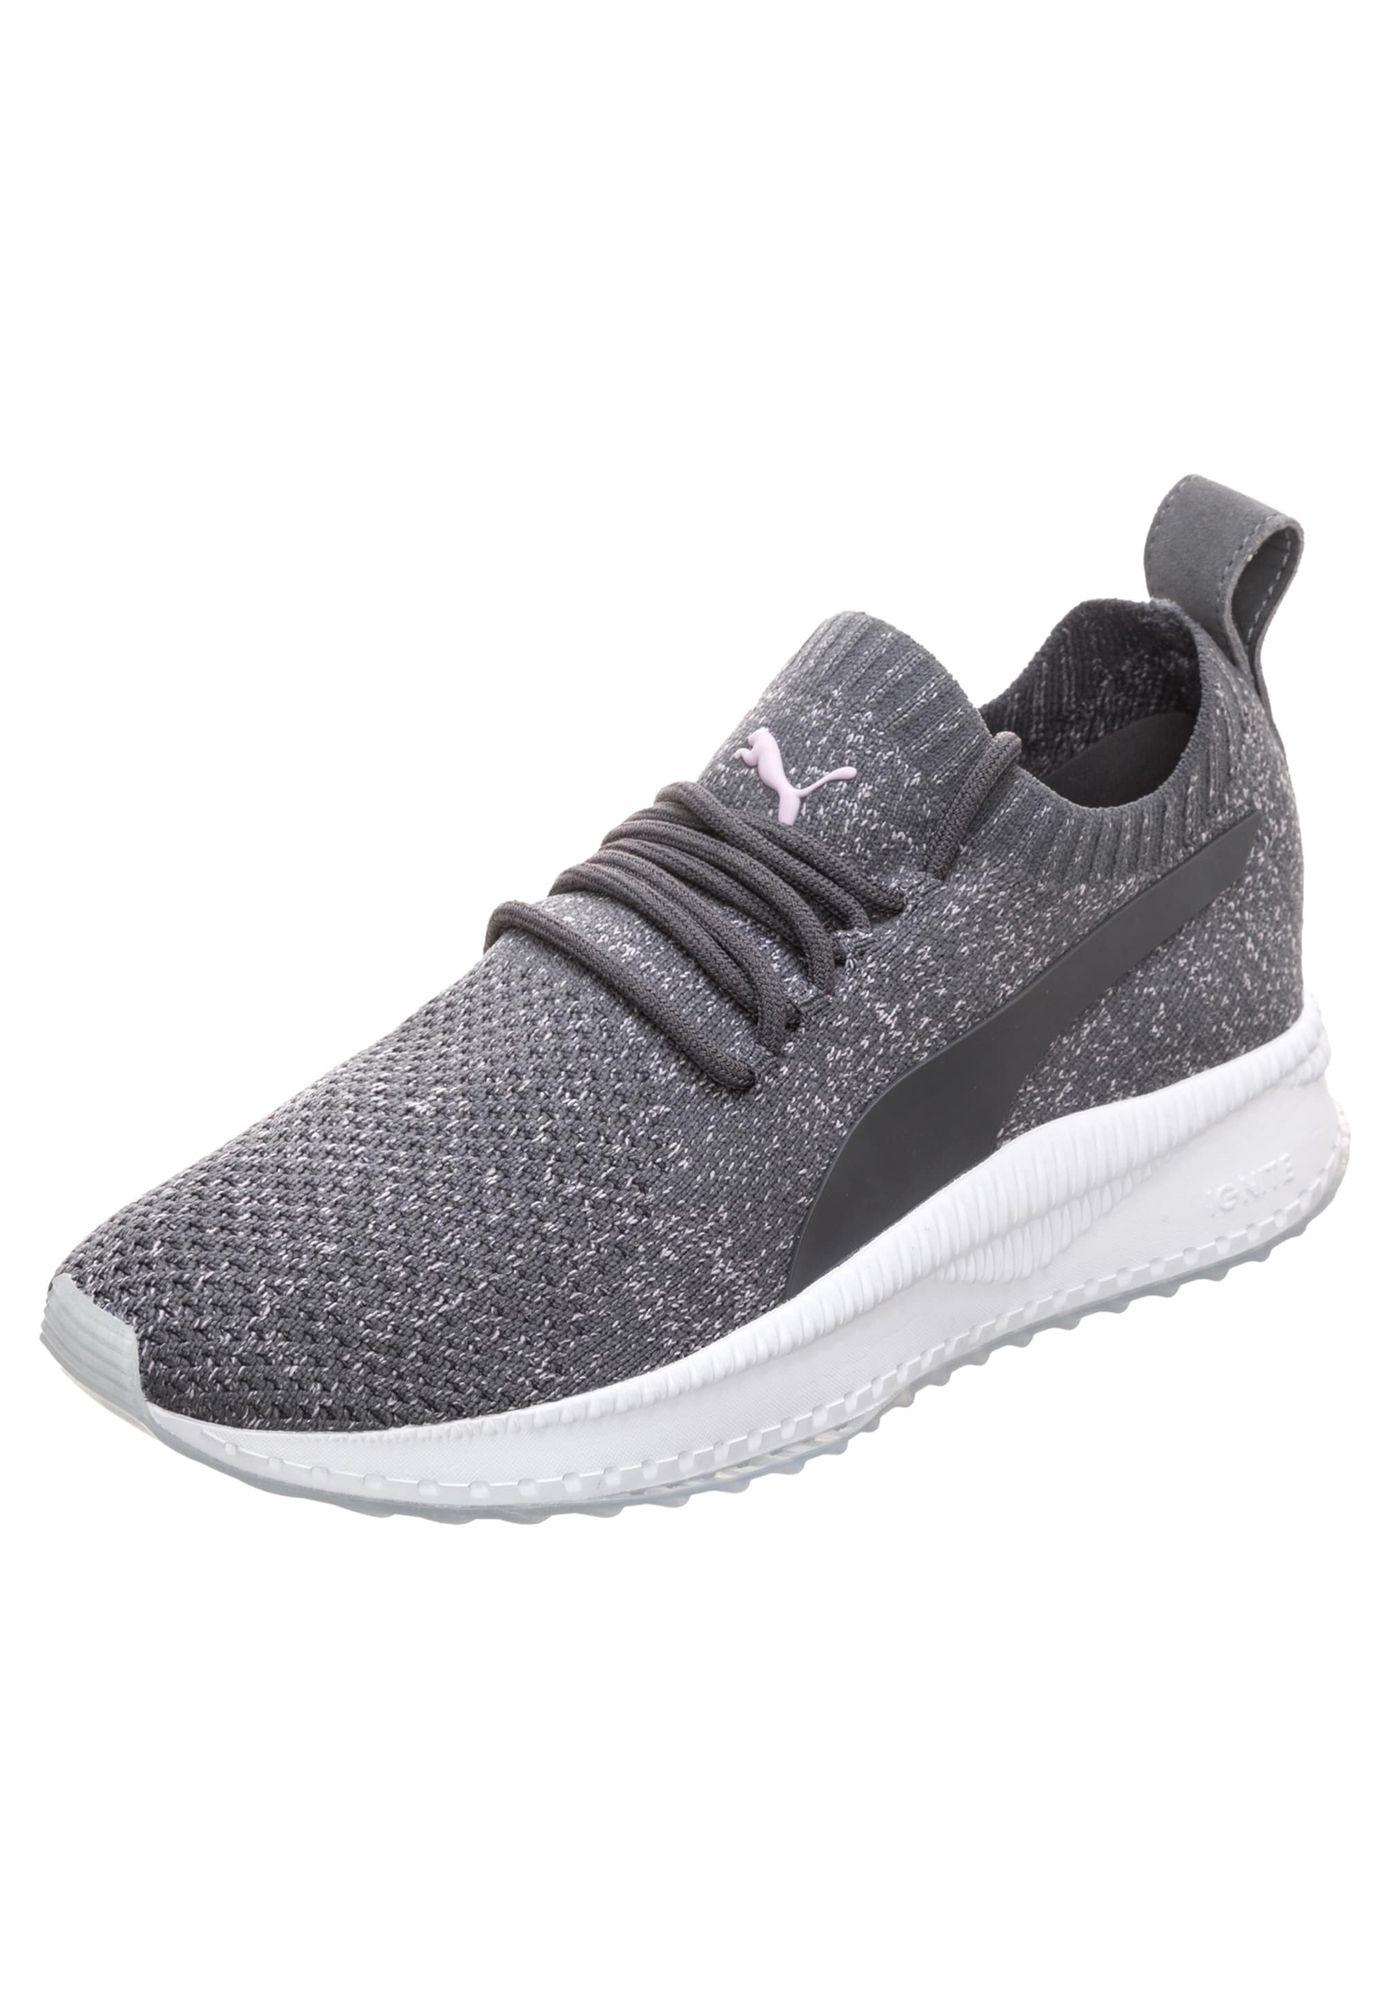 Sneaker ´TSUGI Apex evoKNIT´